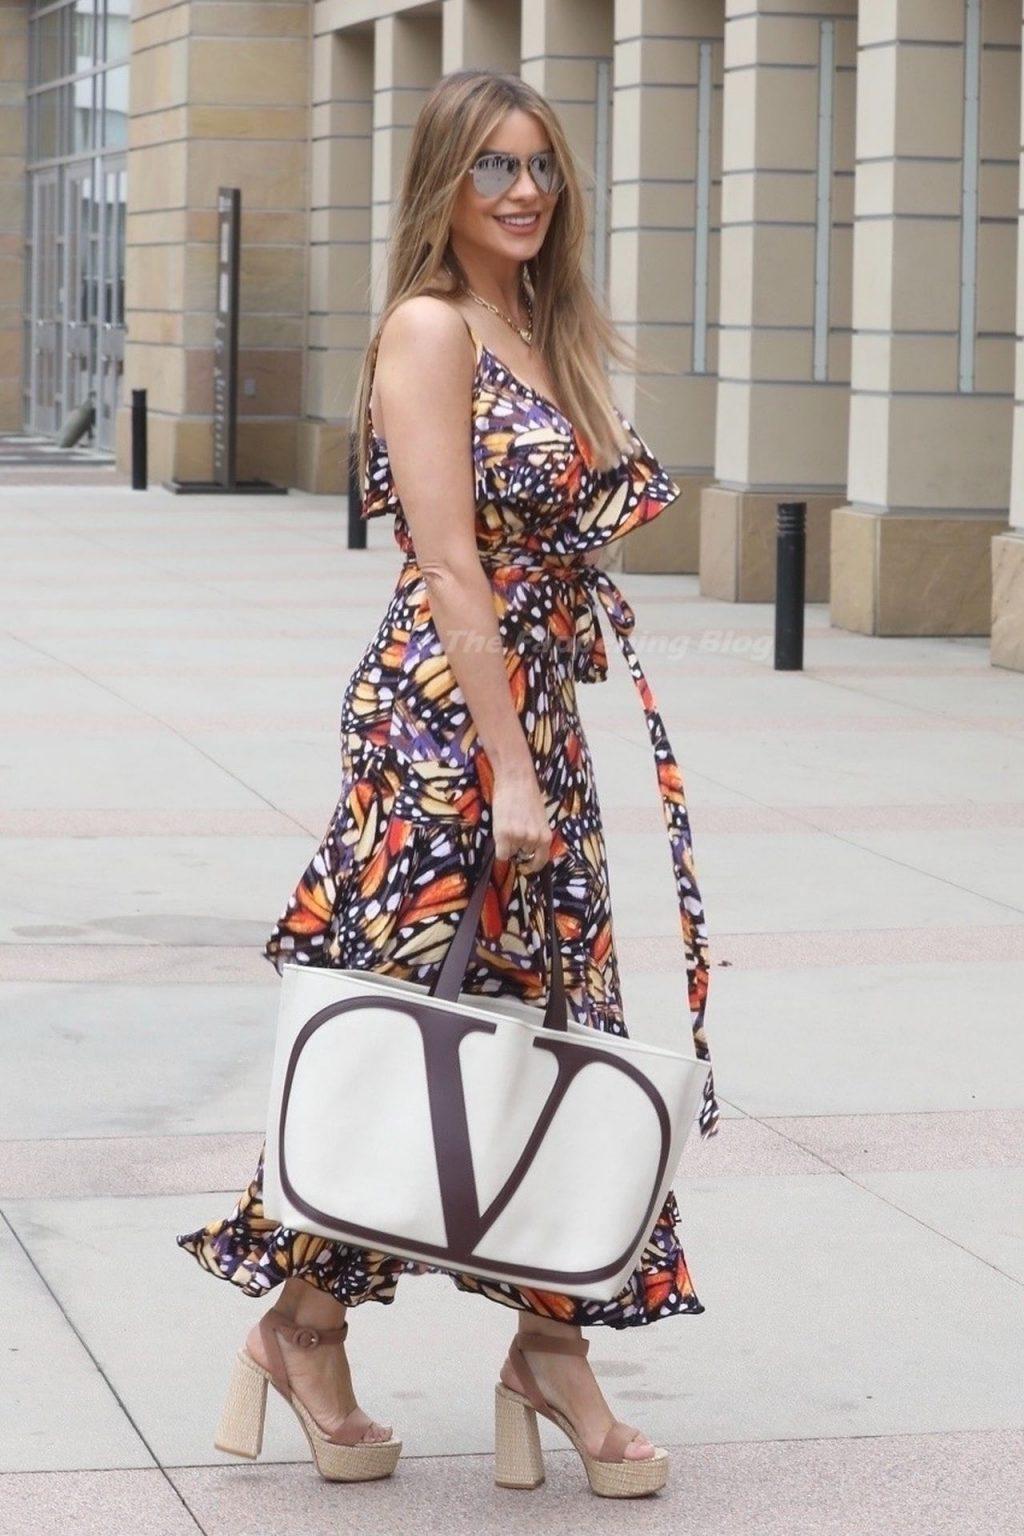 Sofia Vergara is Seen at America's Got Talent Filming (112 Photos)